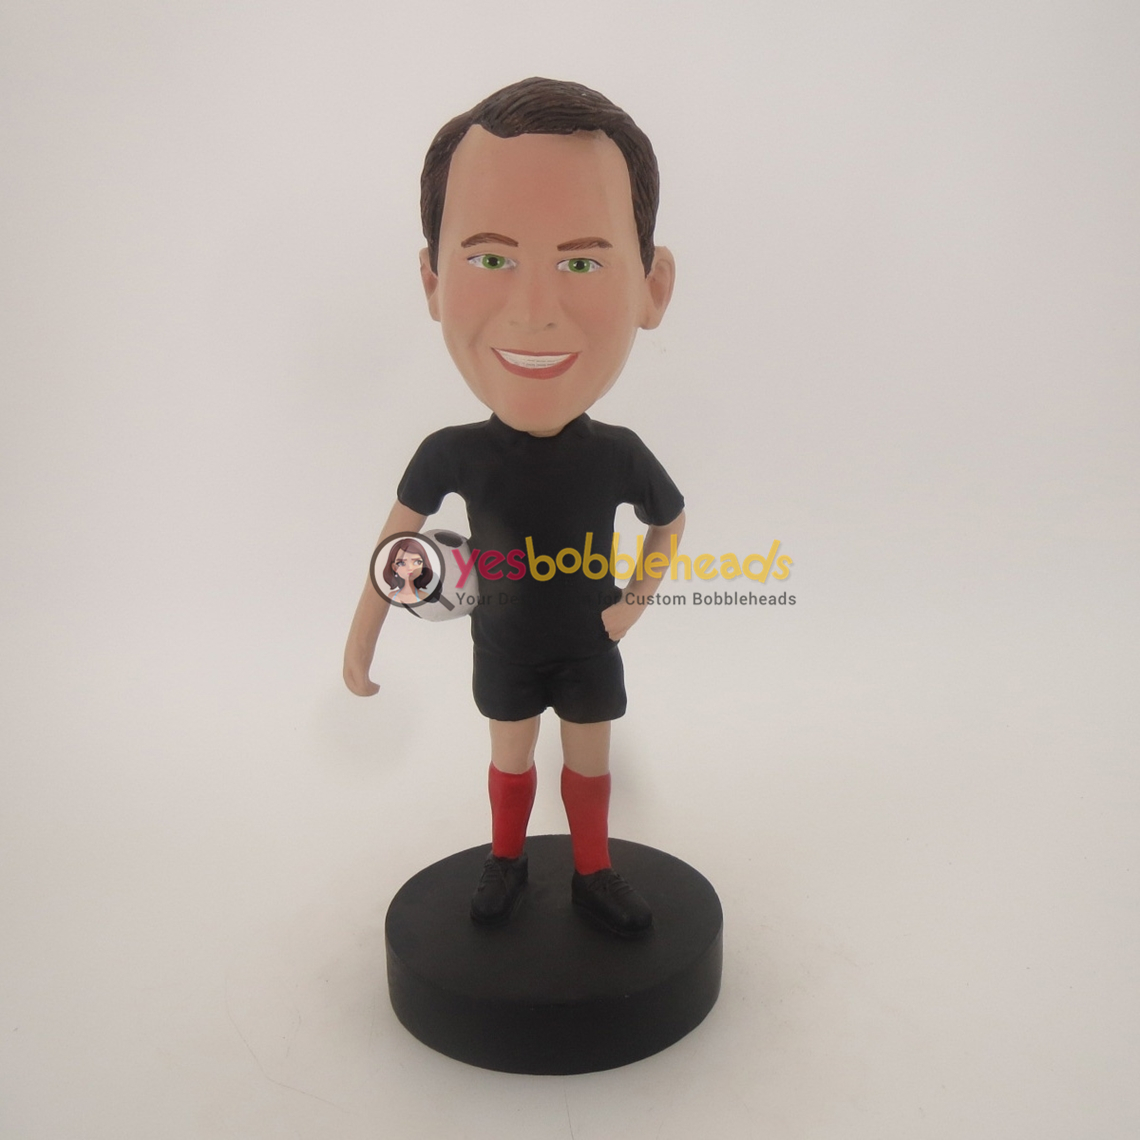 Picture of Custom Bobblehead Doll: Man Holding Soccer